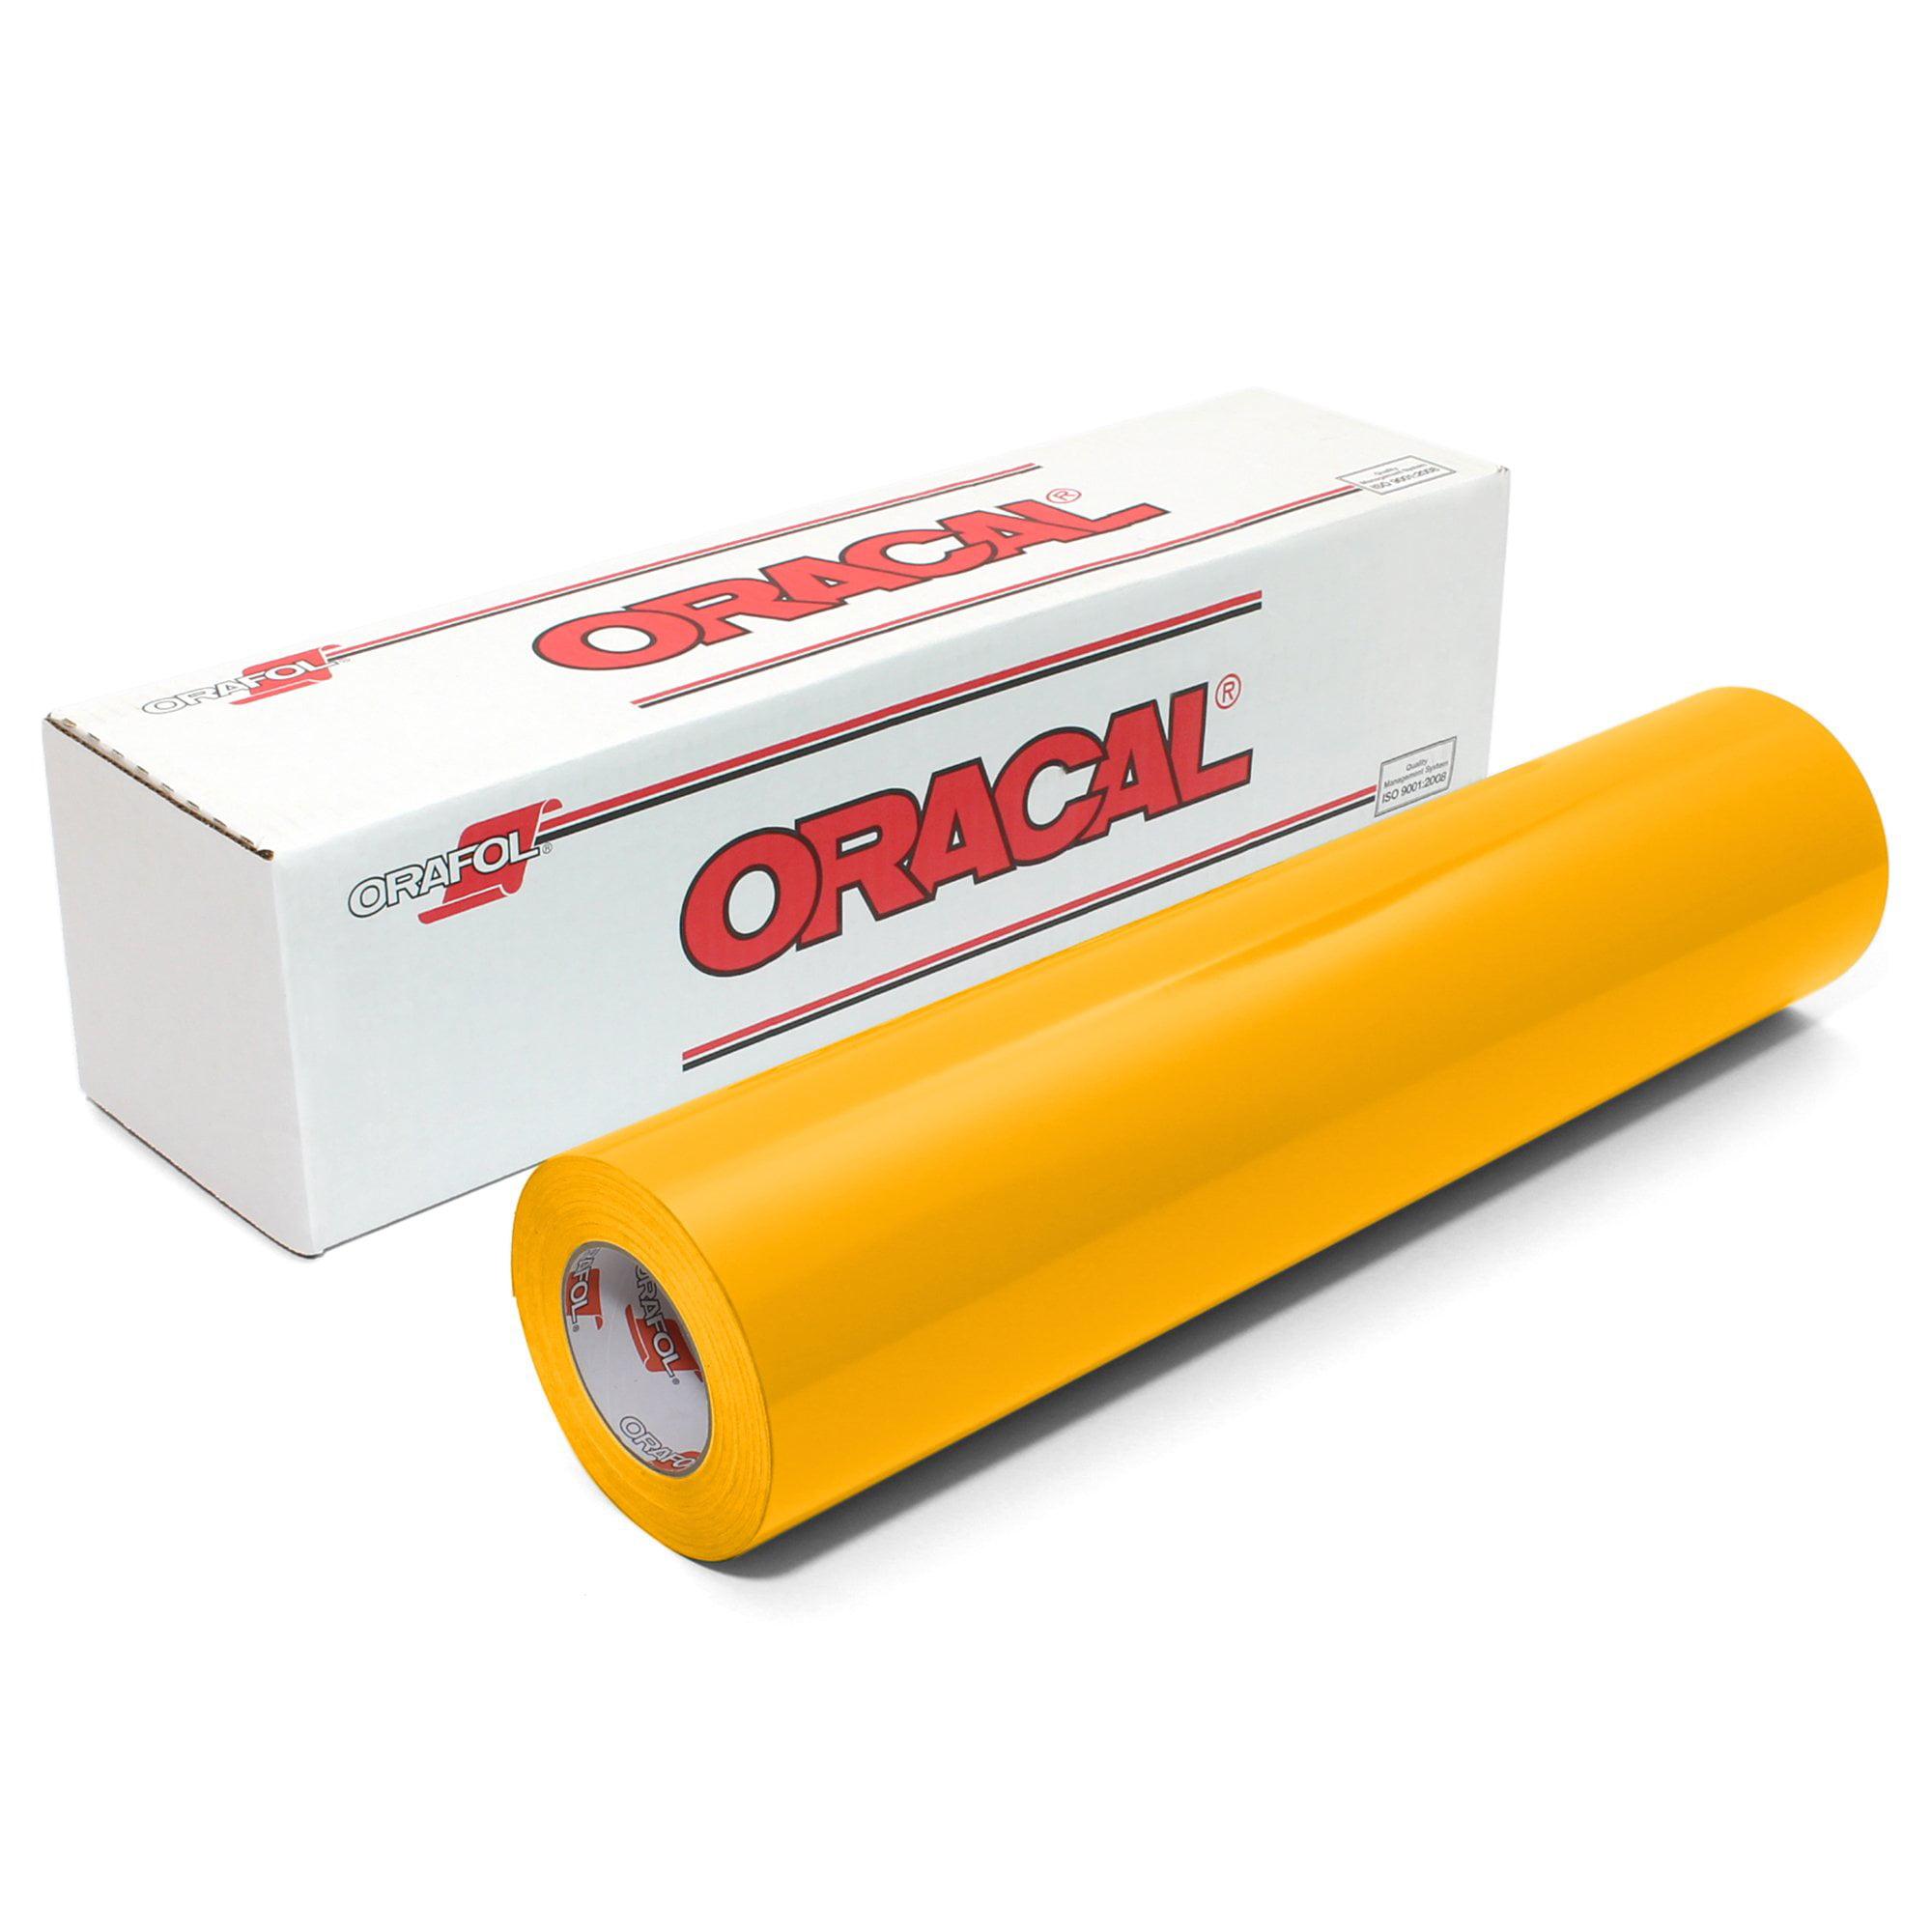 "Oracal 651 Glossy 12"" x 6 Feet Vinyl Rolls - 61 Color"